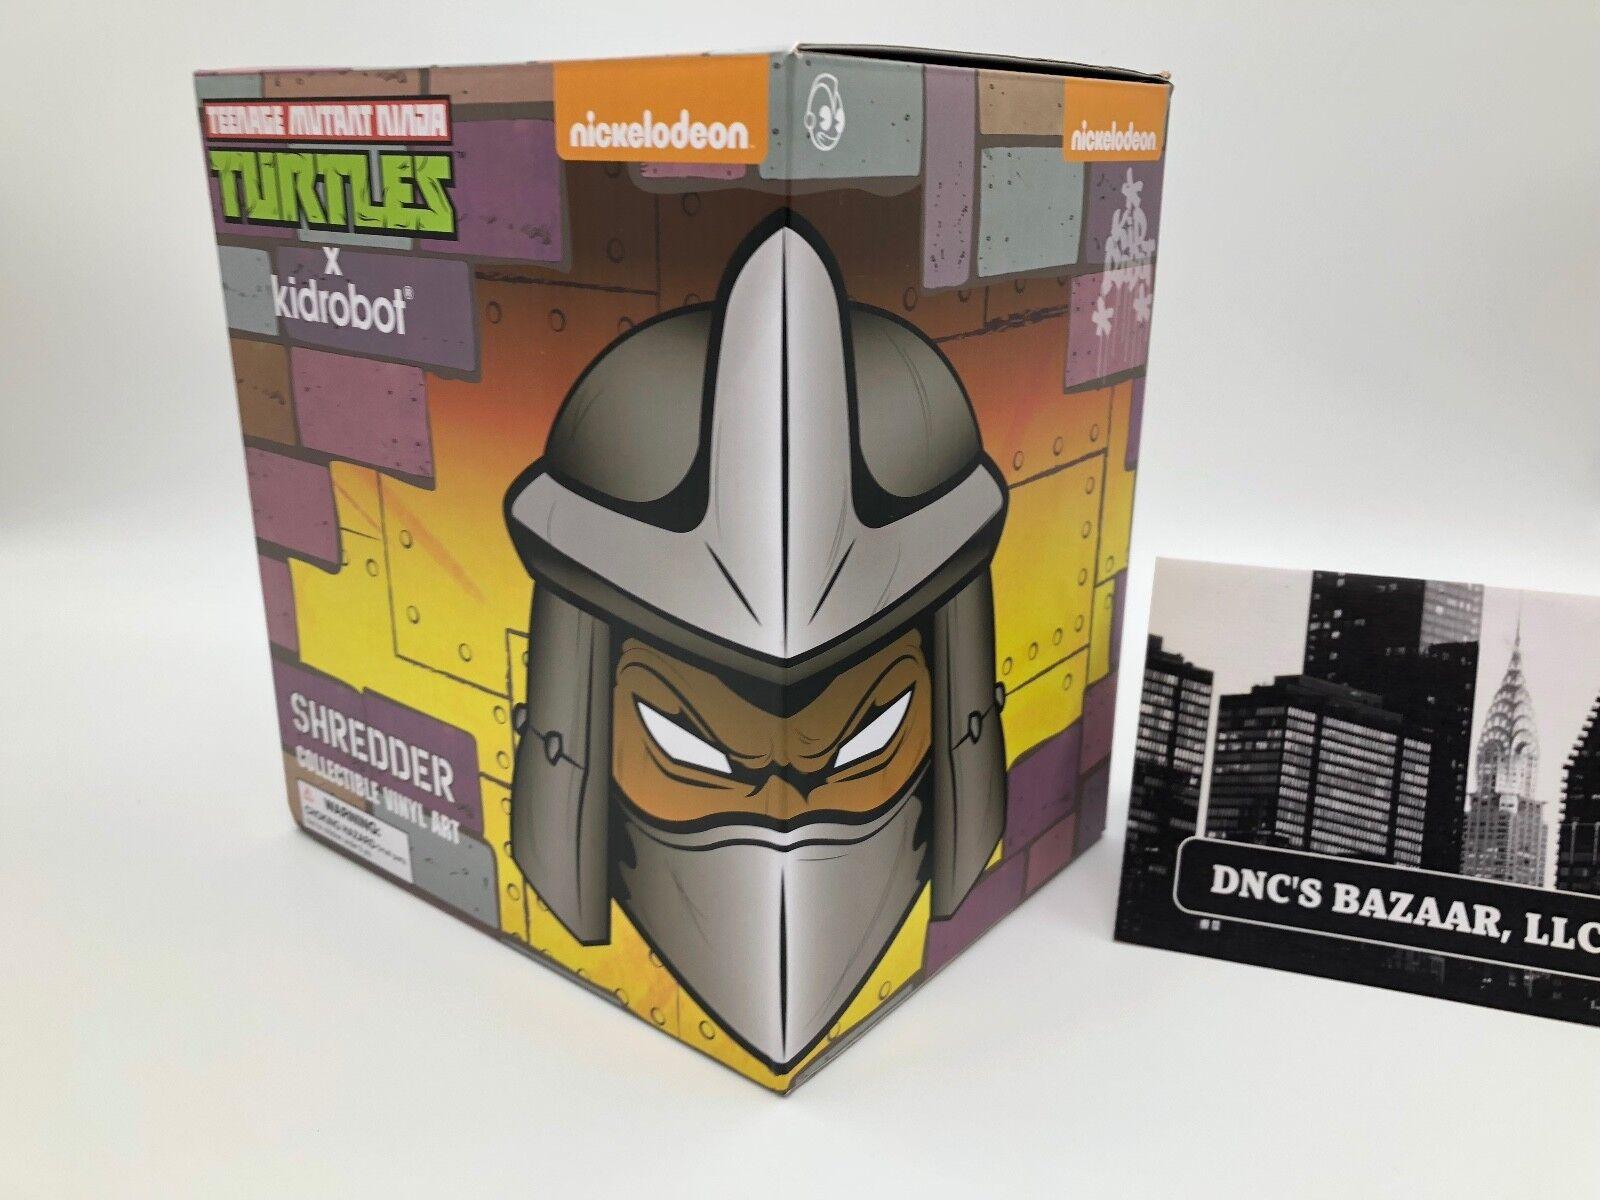 verde Shrossoder  Teenage Mutant Ninja Turtles X Kidrobot Collectible